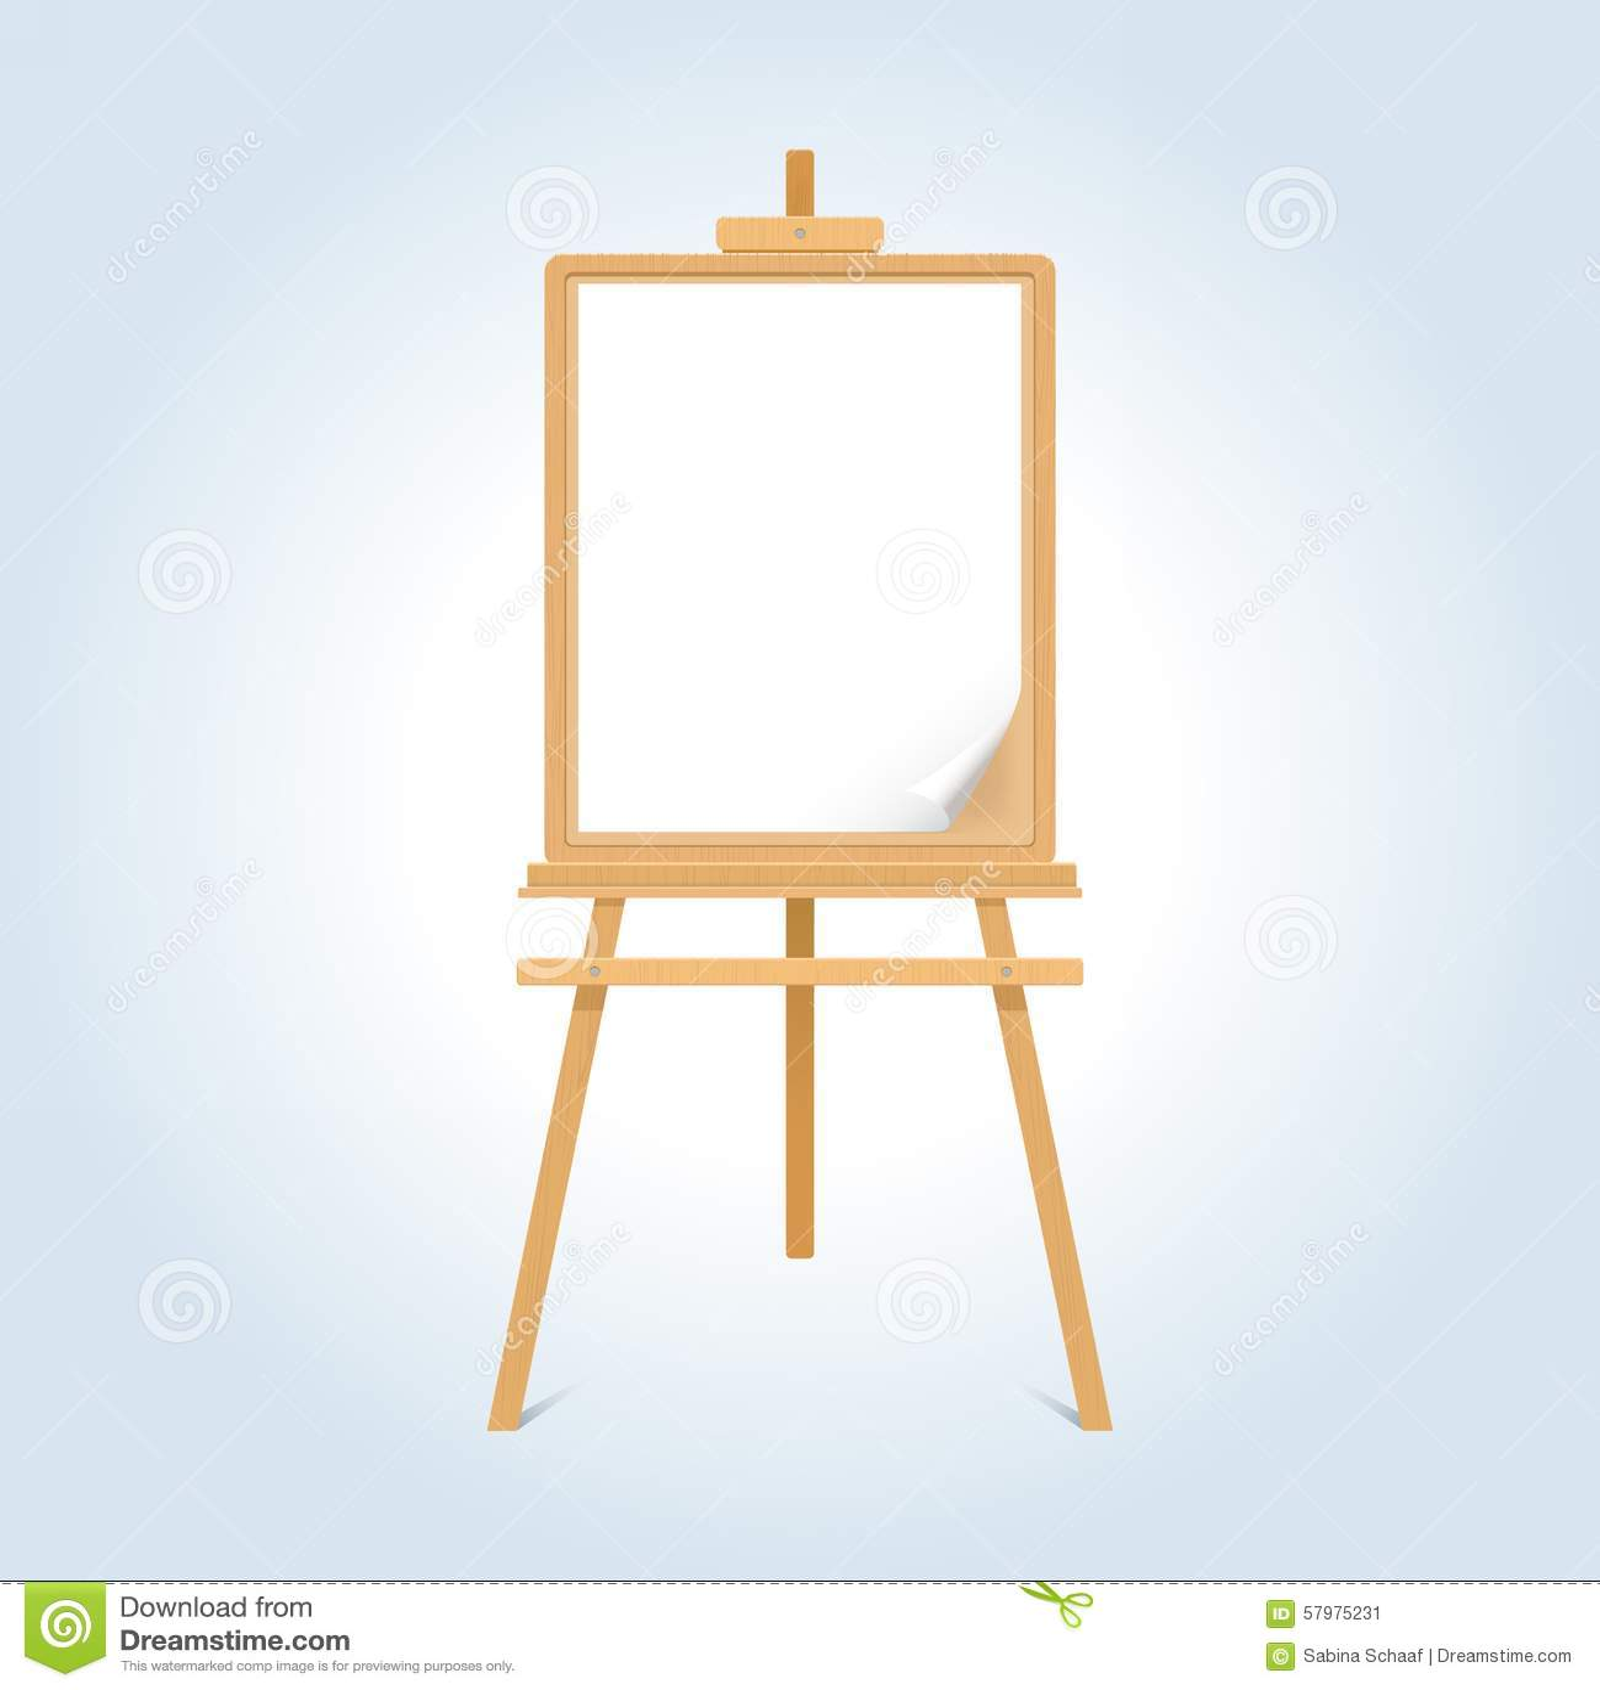 Caballete de madera ilustraci n del vector imagen 57975231 - Caballetes de madera ...